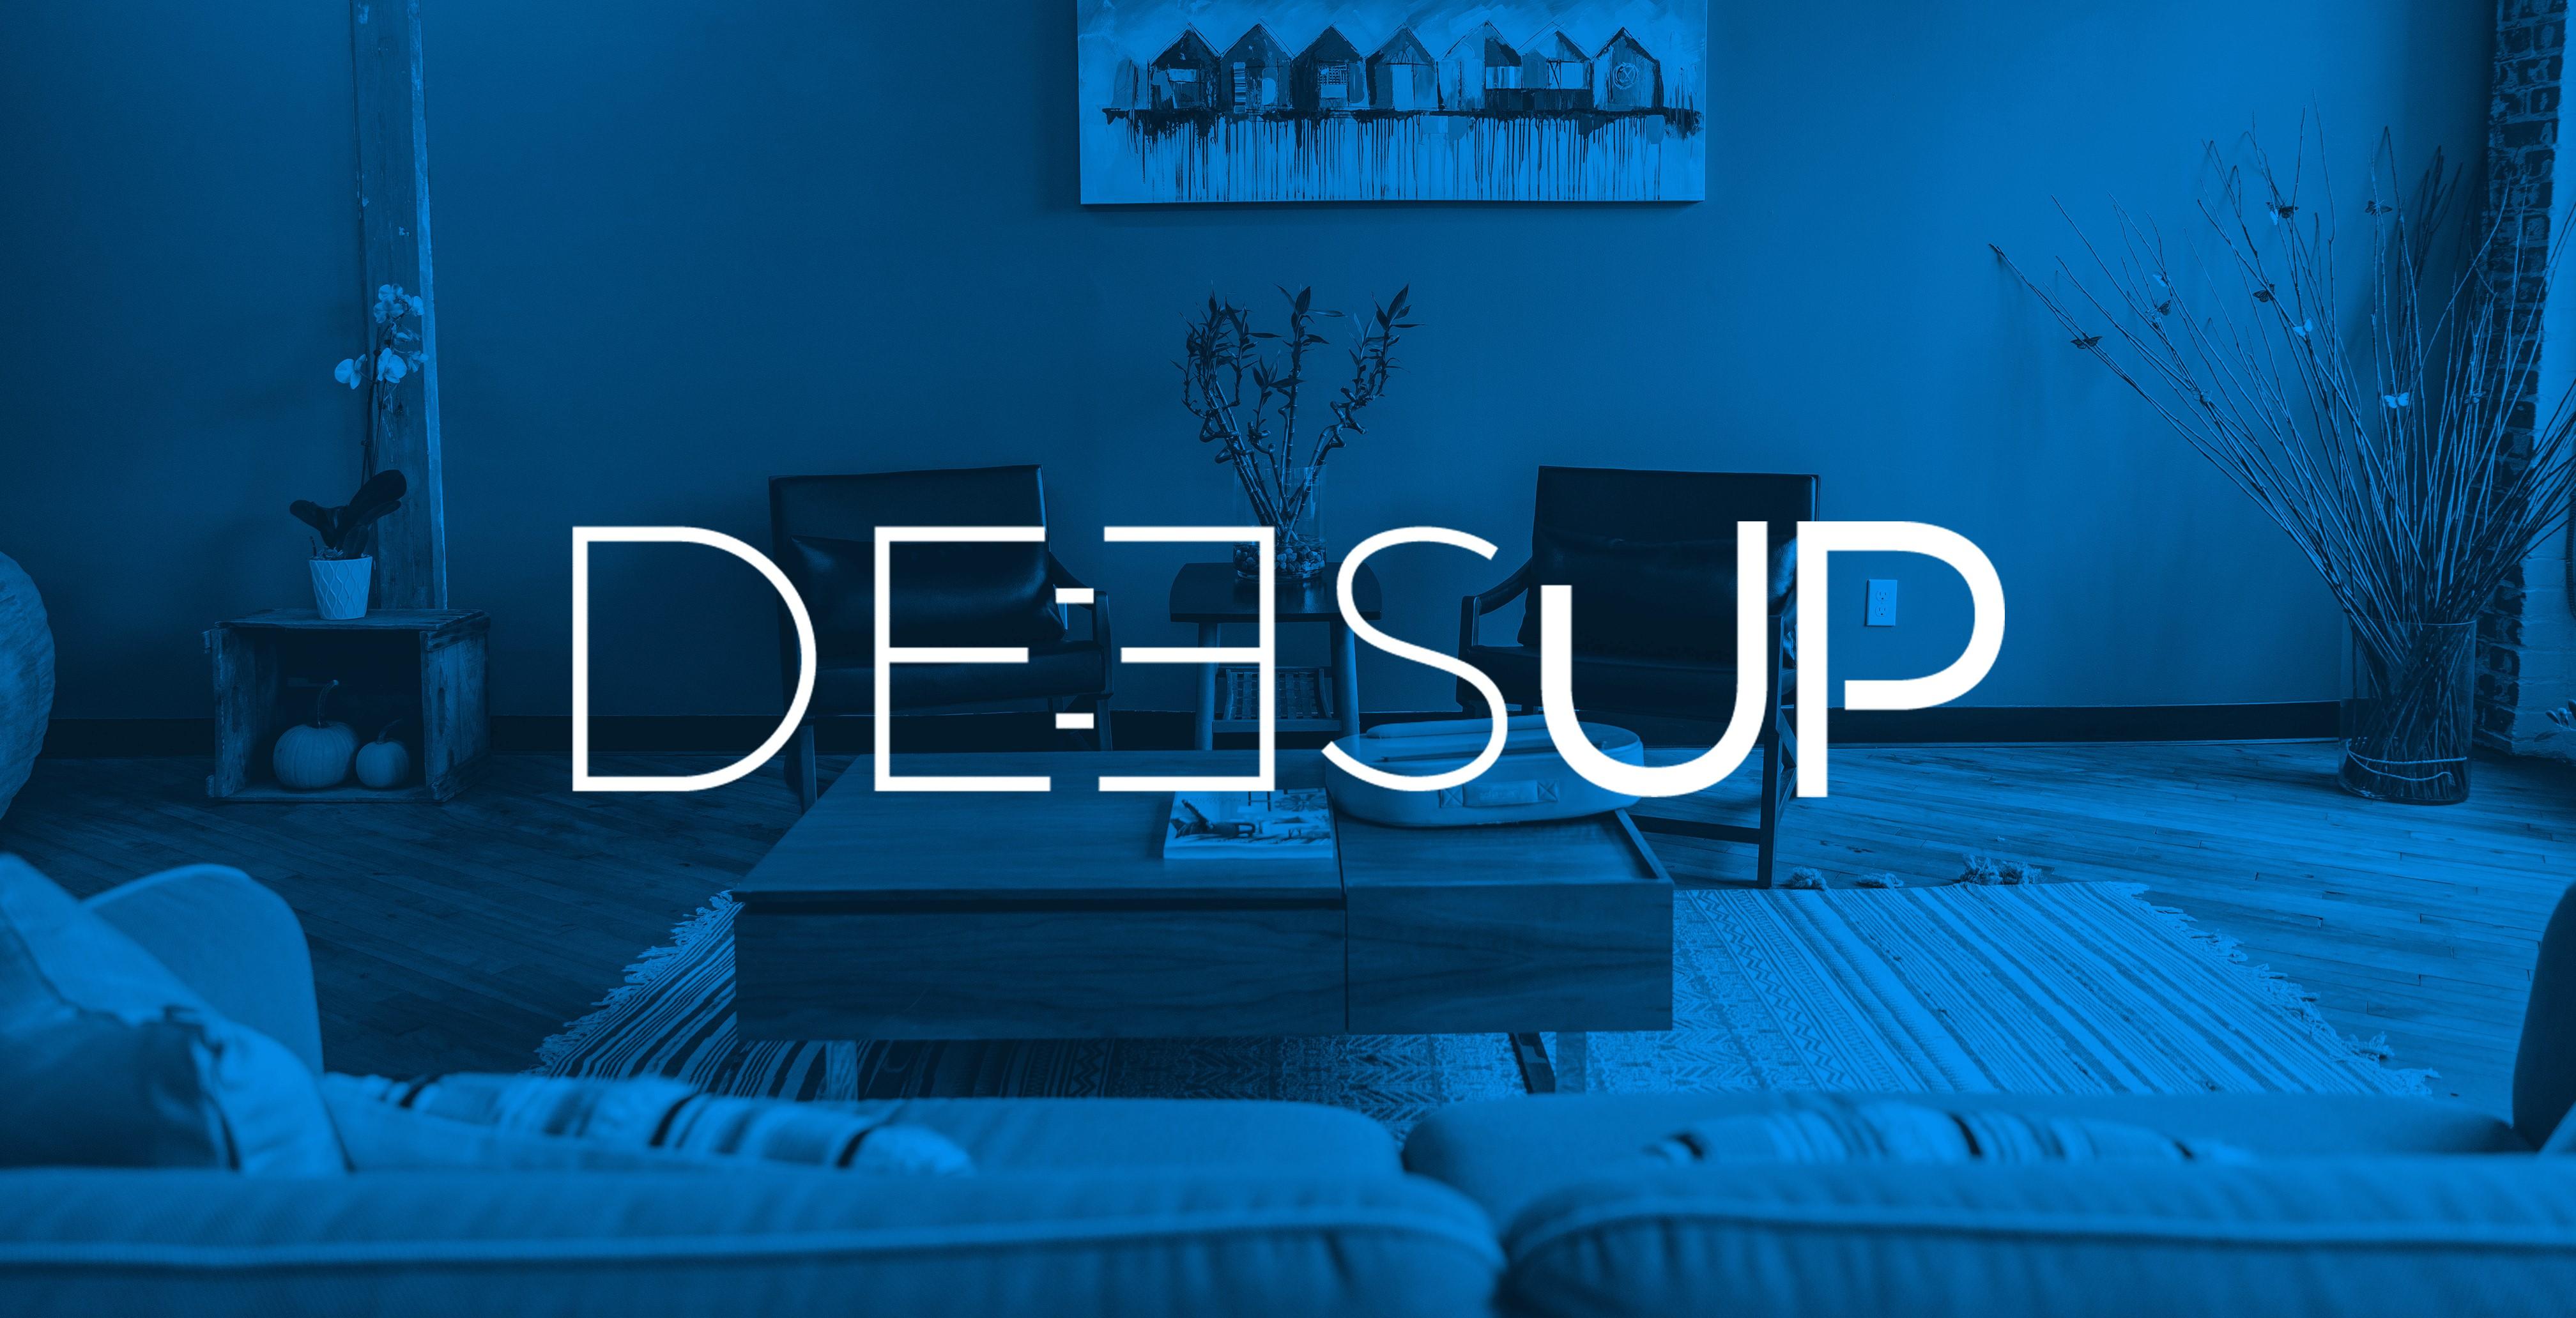 Deesup logo